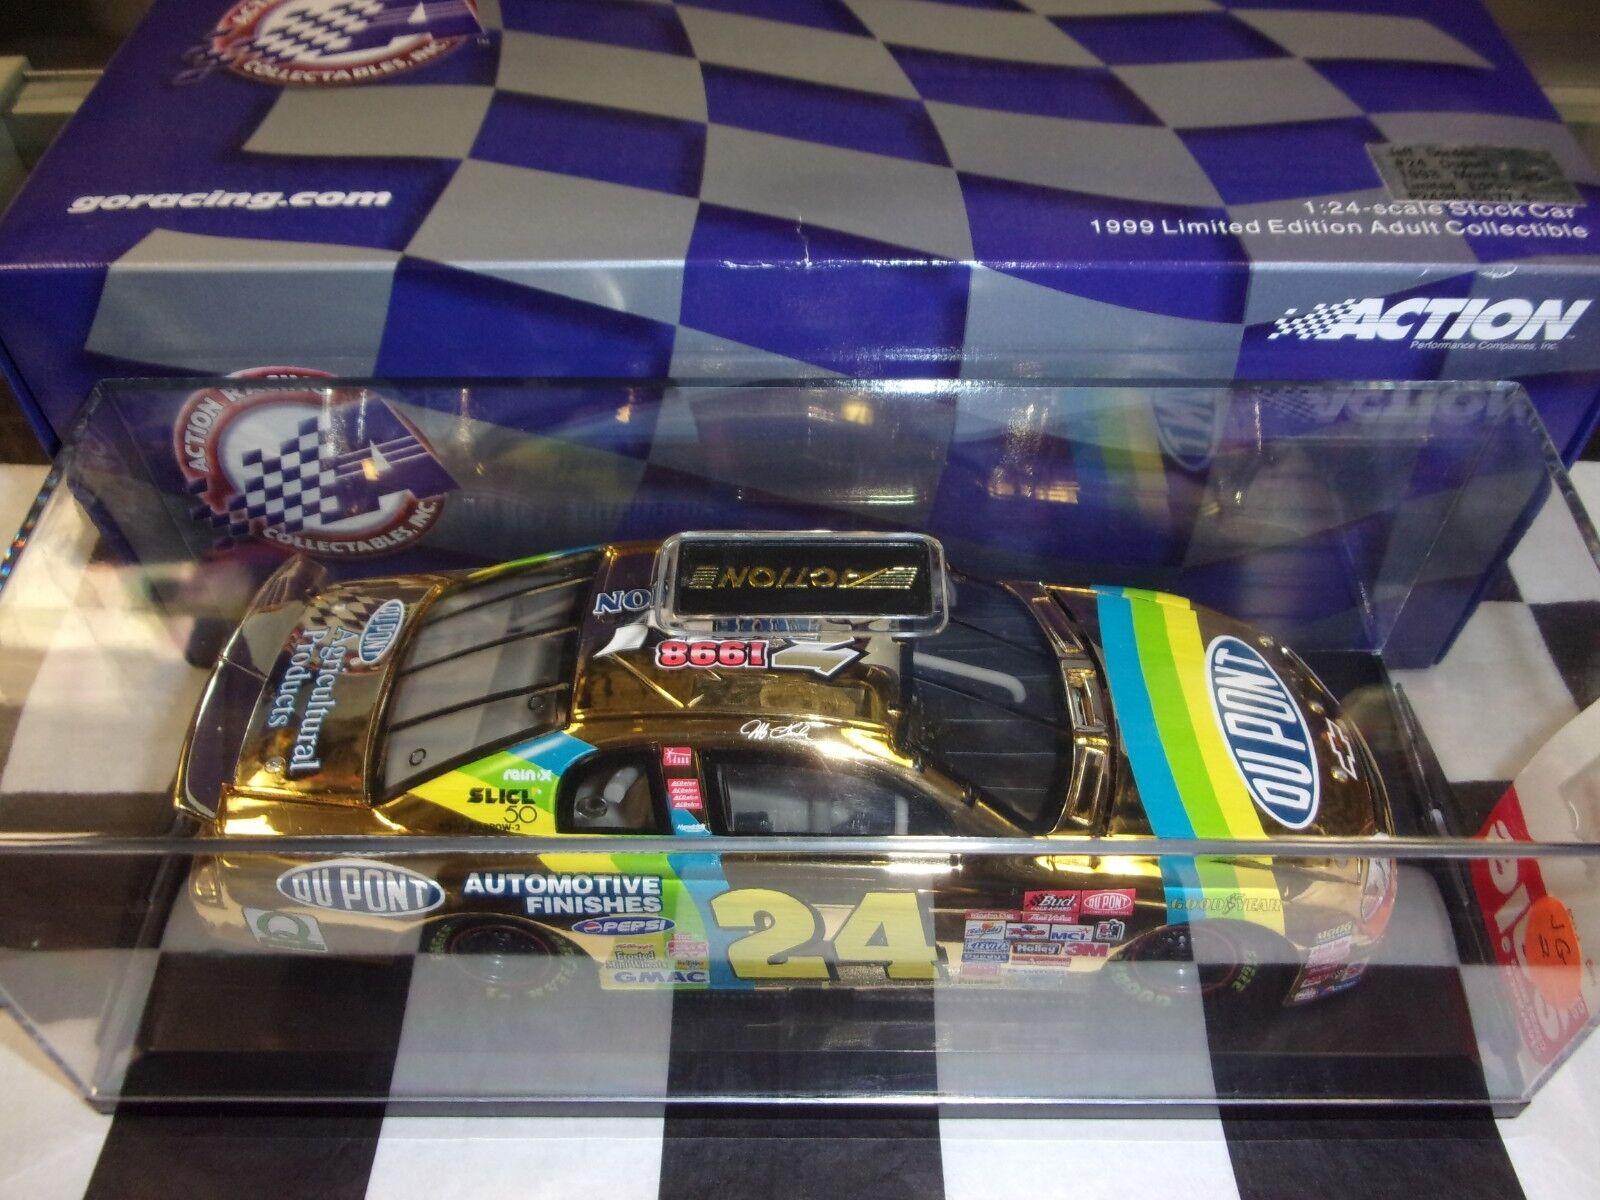 Jeff Gordon DuPont 3x Champ 24K gold 1999 Action NIB 1 24 scale Car NASCAR